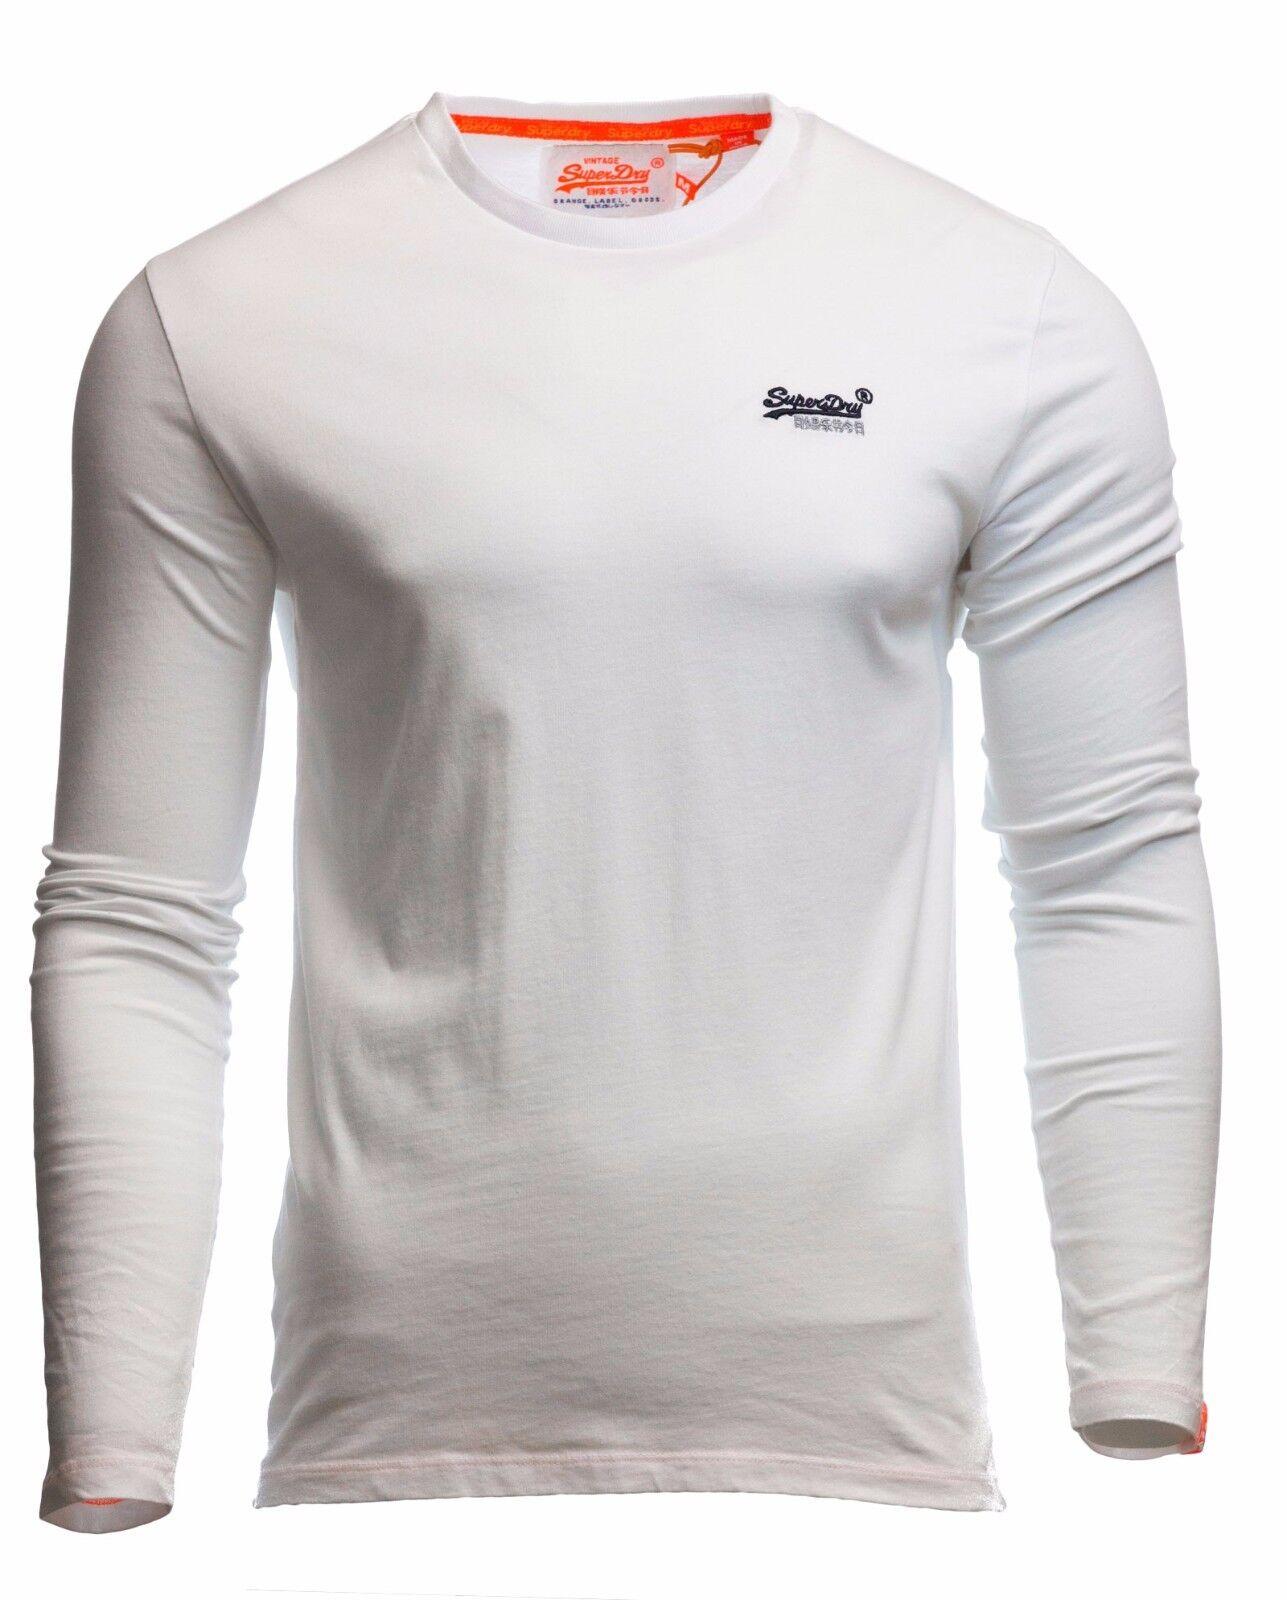 Superdry Orange Label Baseball Long Sleeve T Shirt Men's T